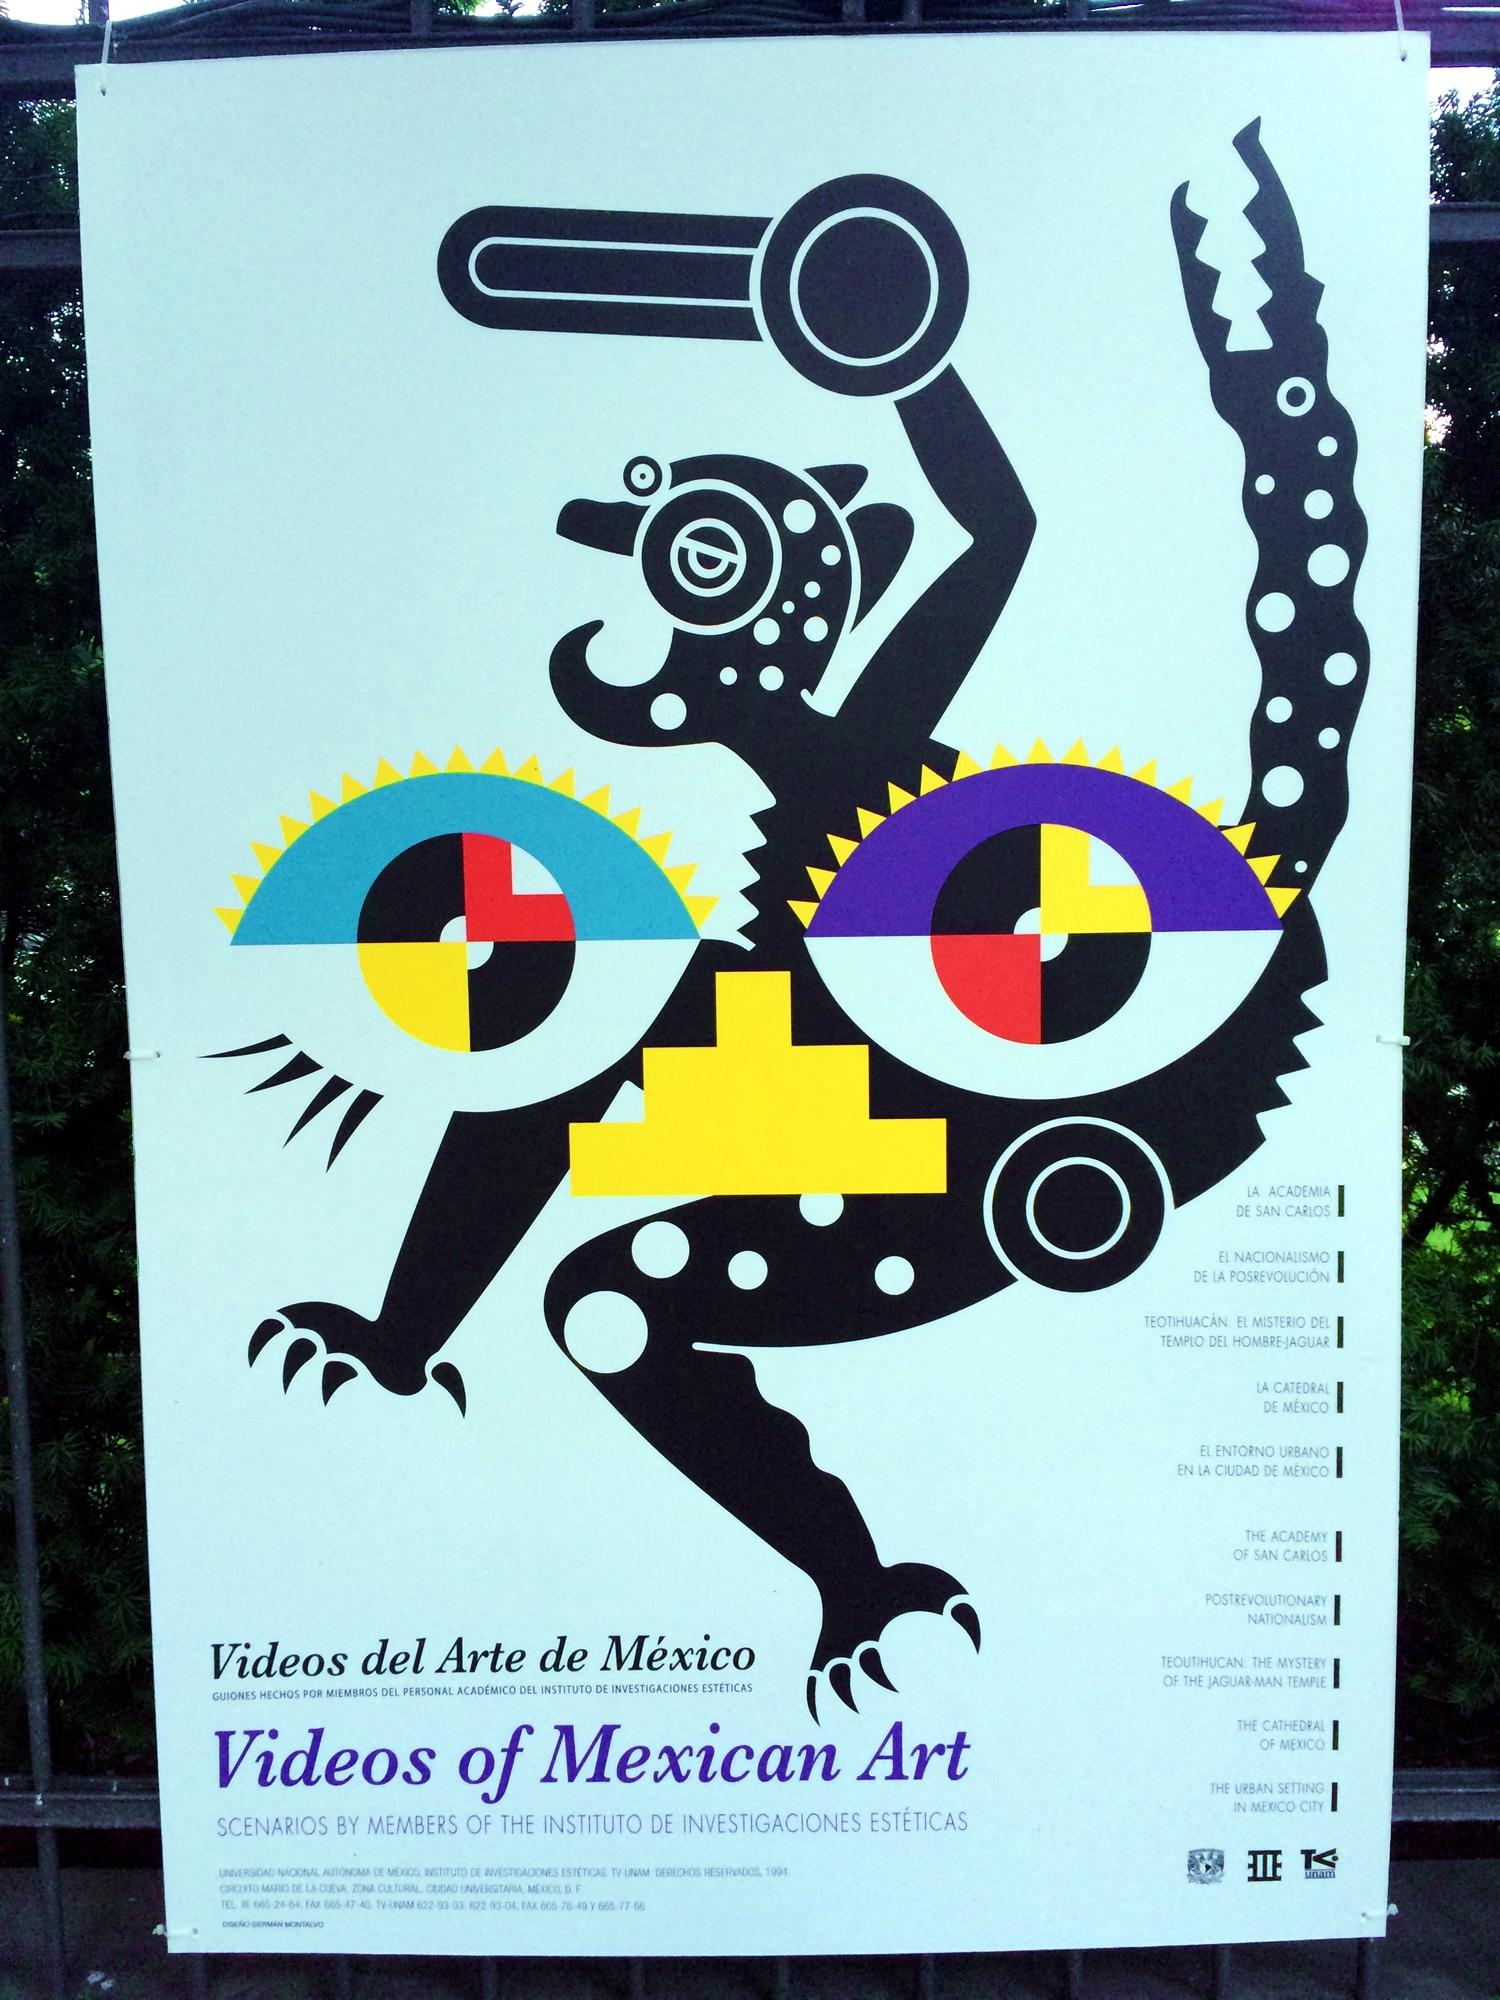 33 Mexican poster street art design plakat meksykanski projektowanie uzytkowe sztuka uliczna FORelementspl